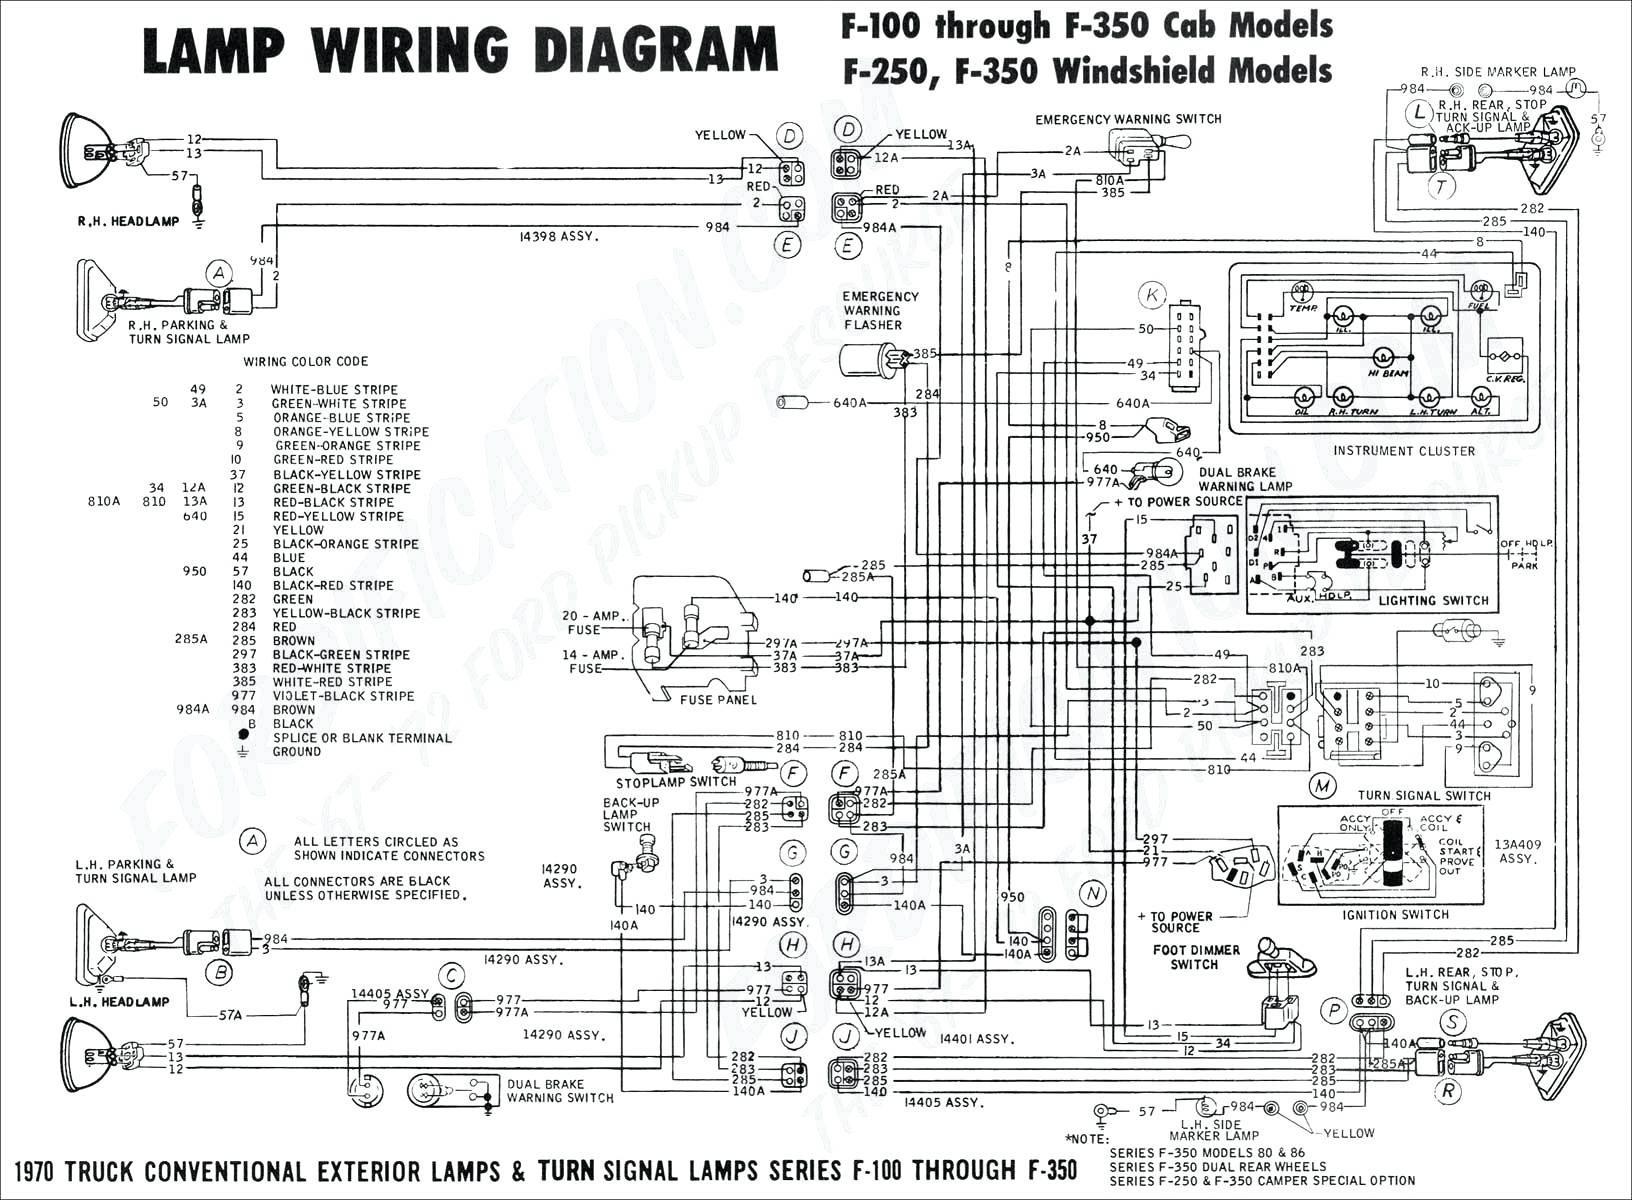 2005 chevy cavalier engine diagram